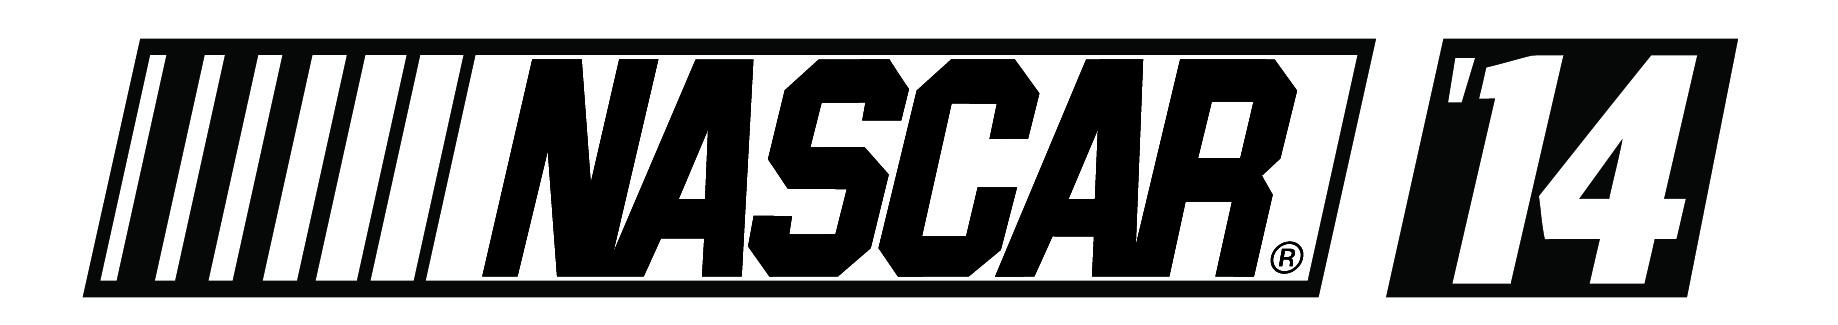 The NASCAR 2014 season is set Nascar Logo Png